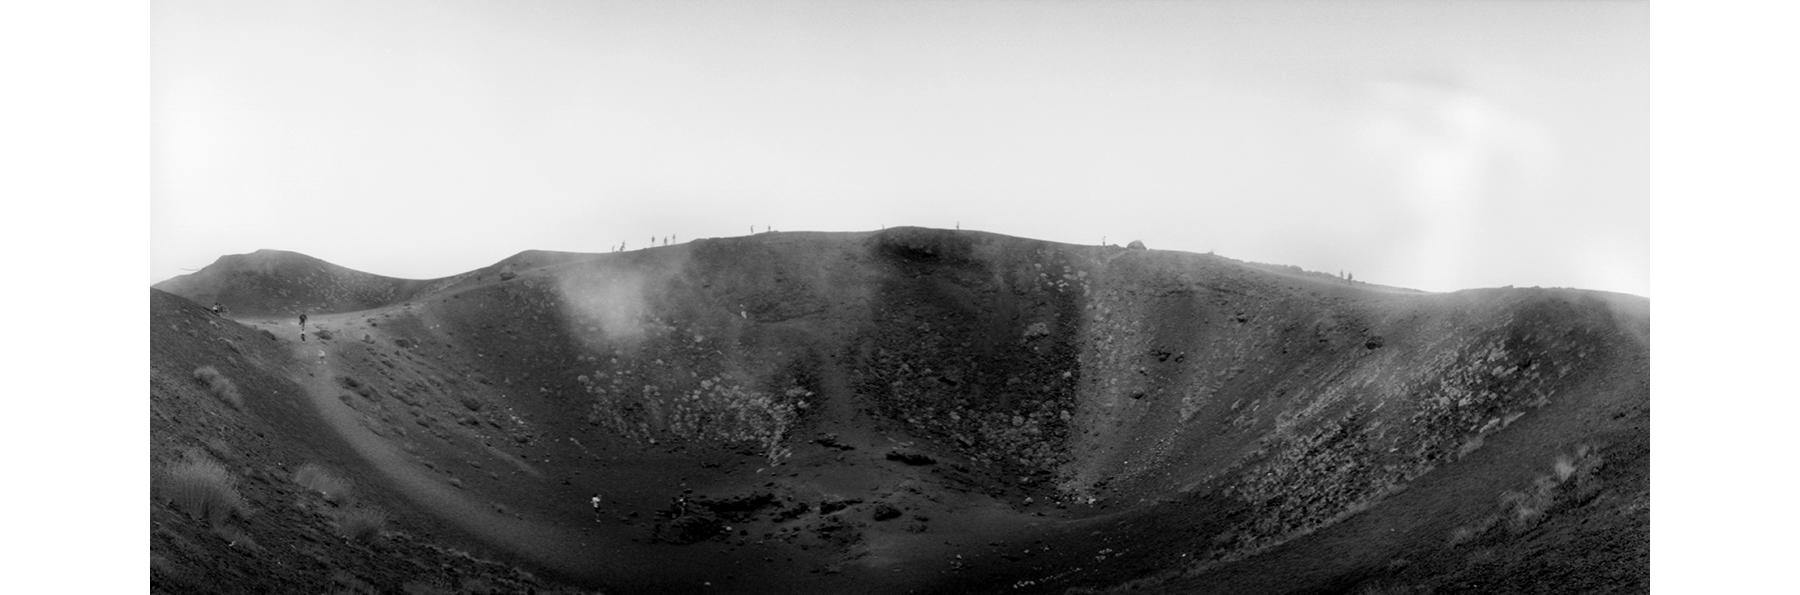 06_Sicily #48 Mount Etna Pano sheet 14 frame 19